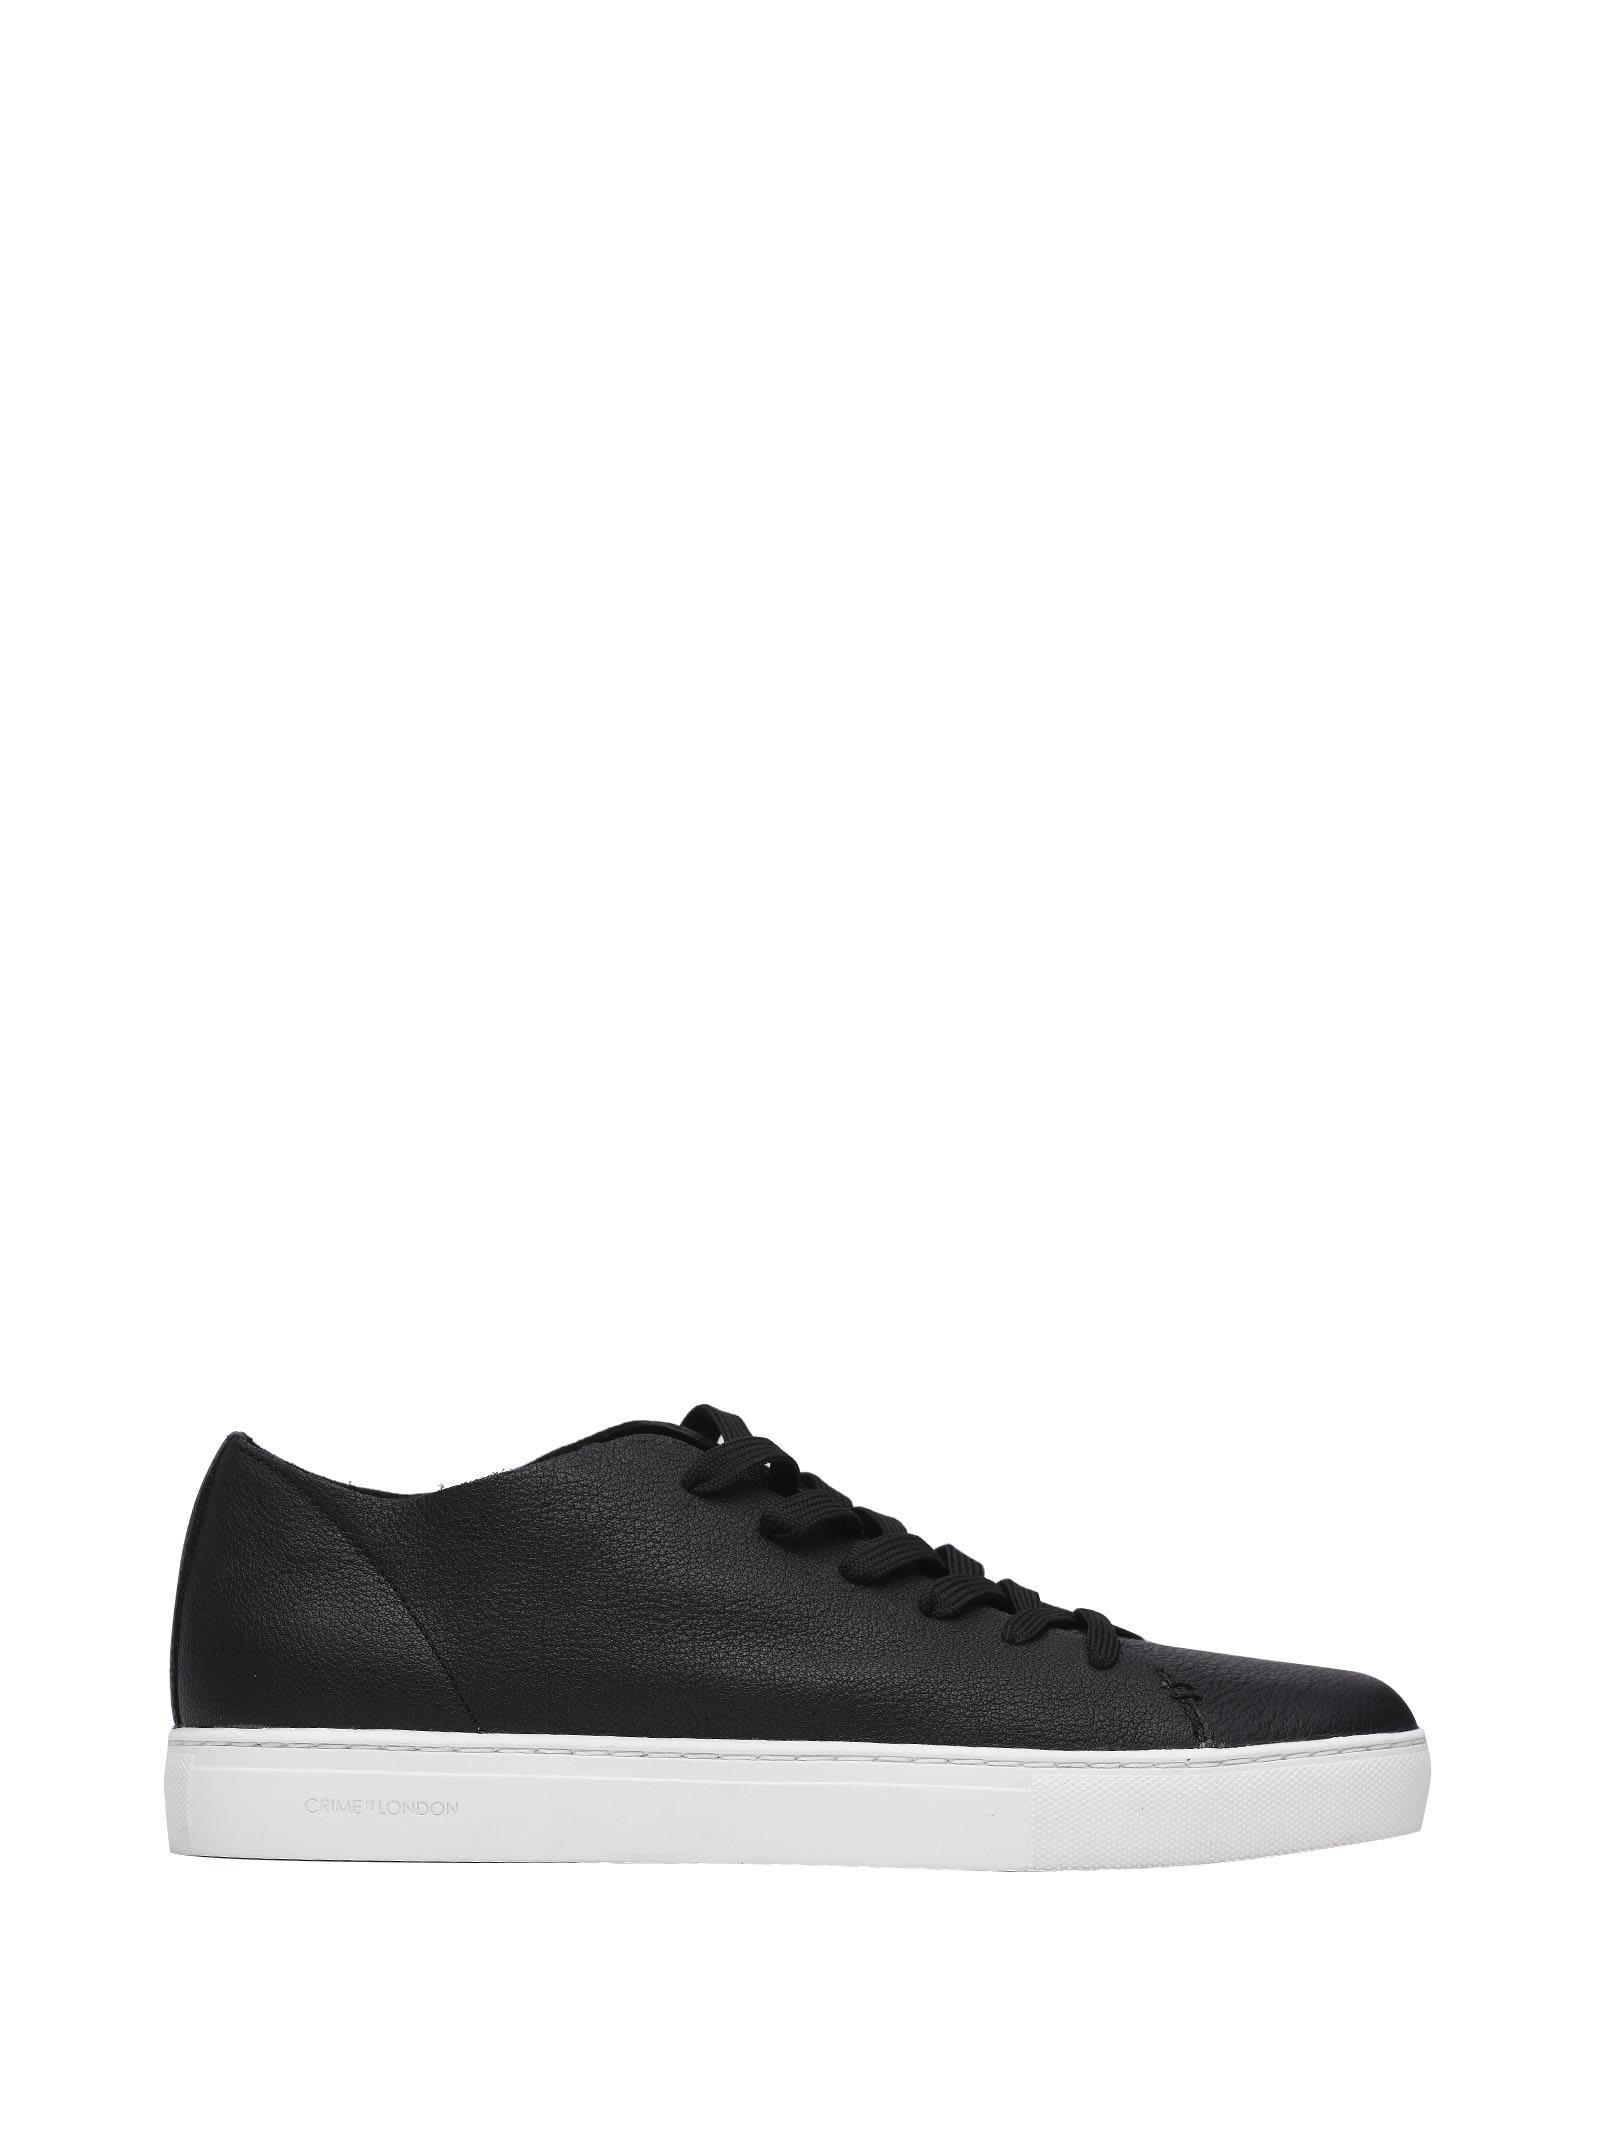 Crime London Black Sneakers